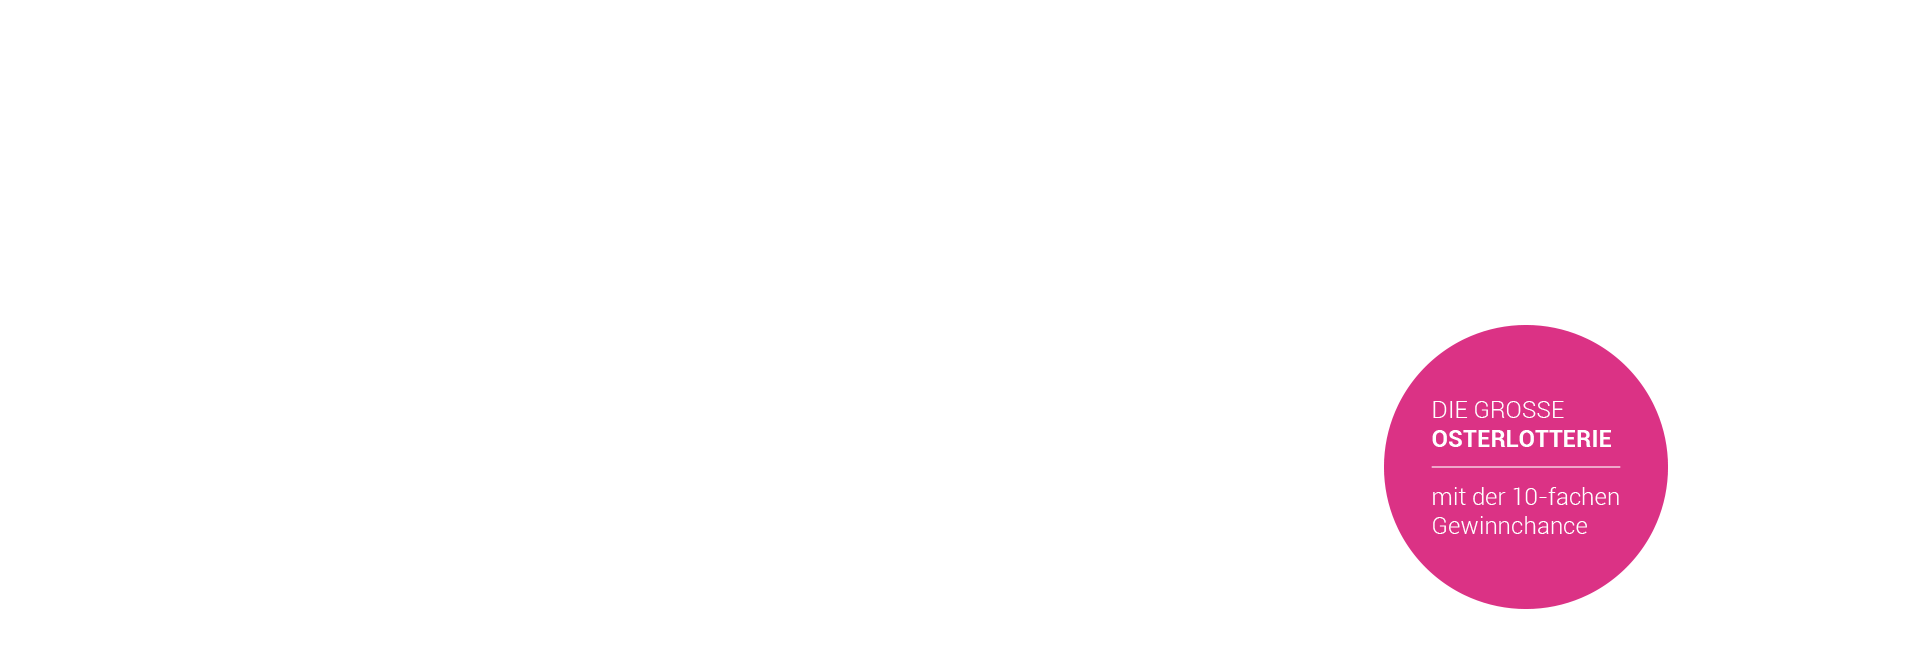 Osterlotterie